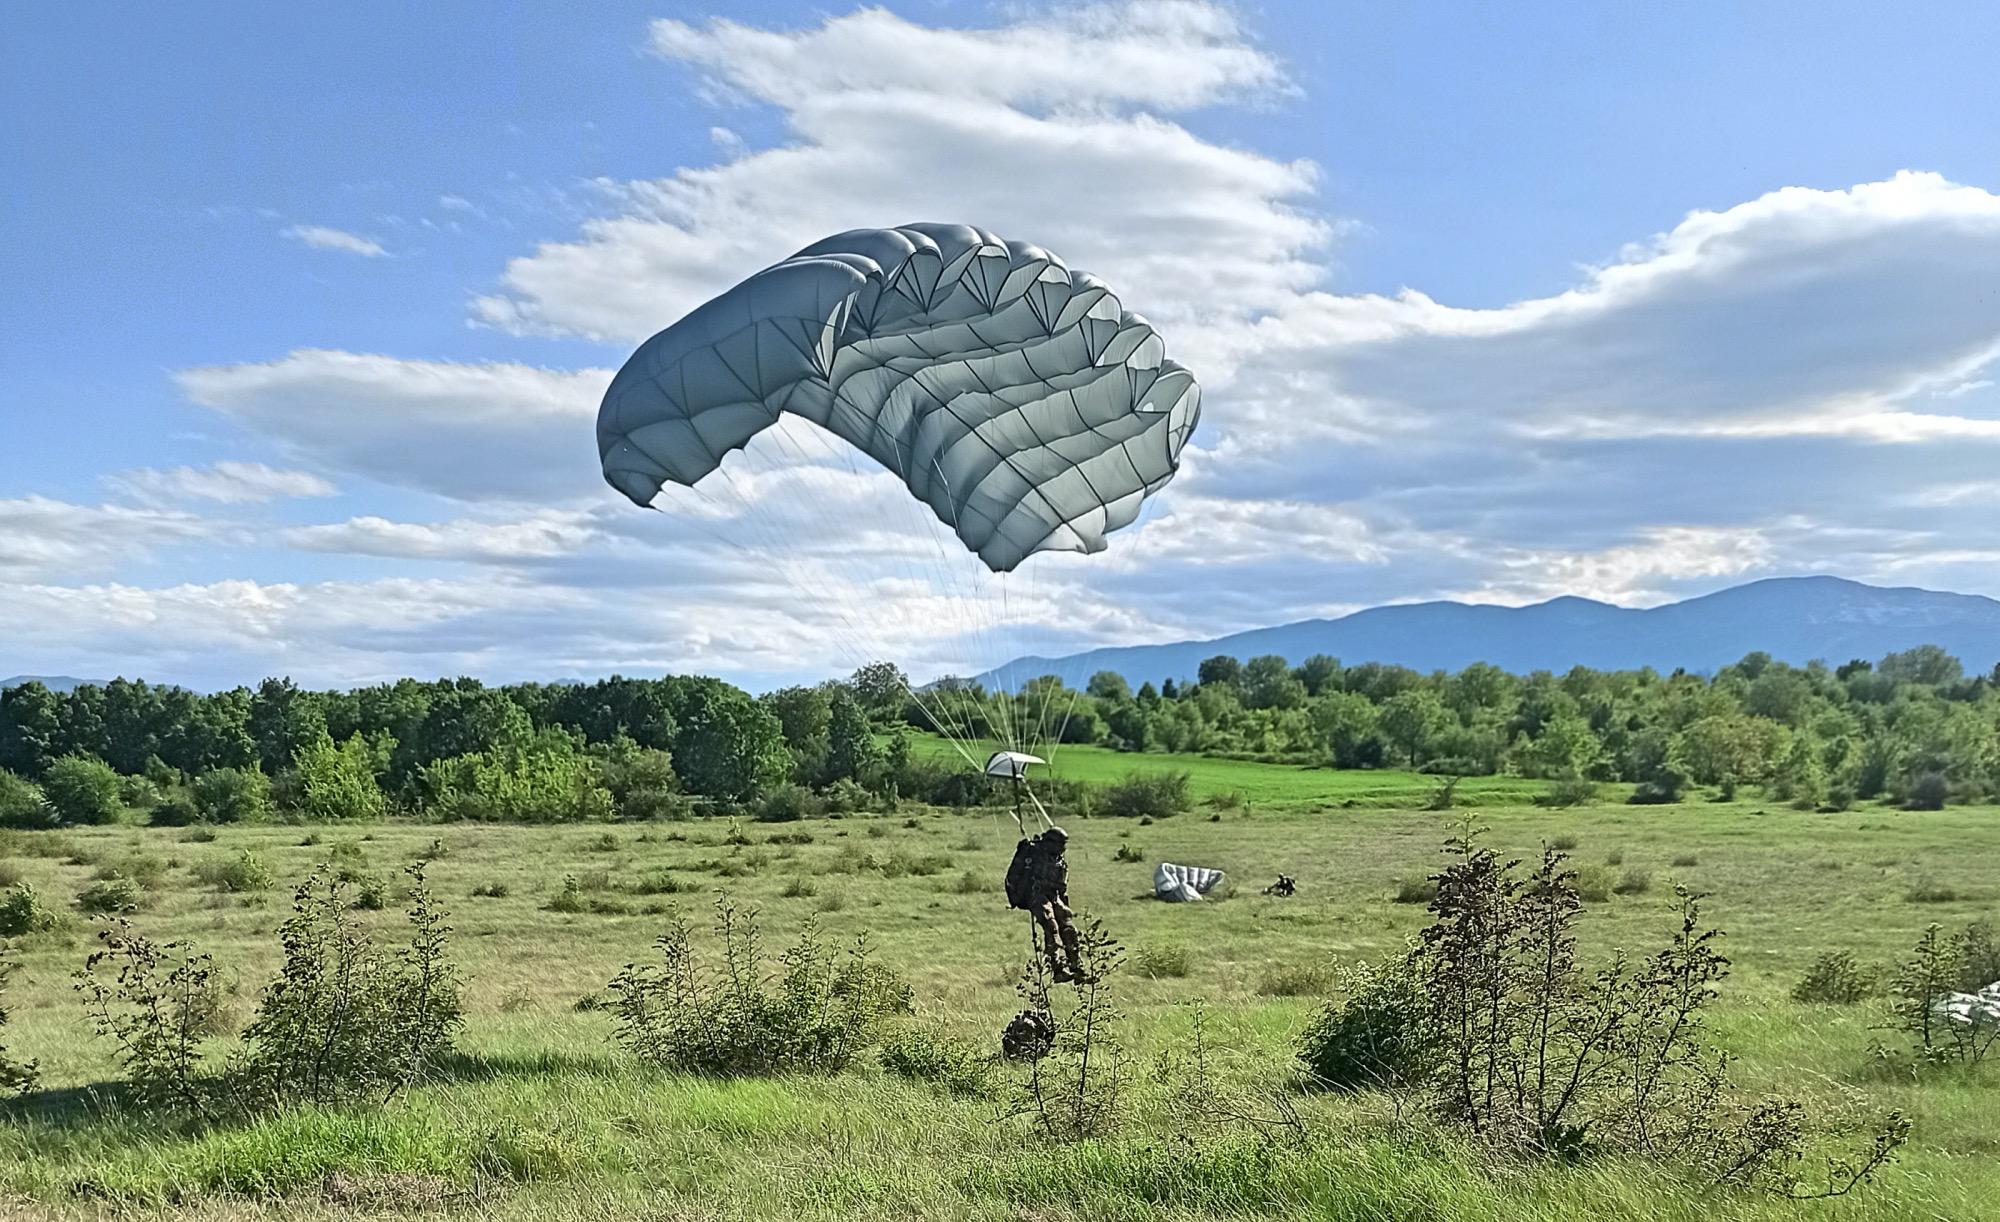 01 paracadutista in atterraggio (002)